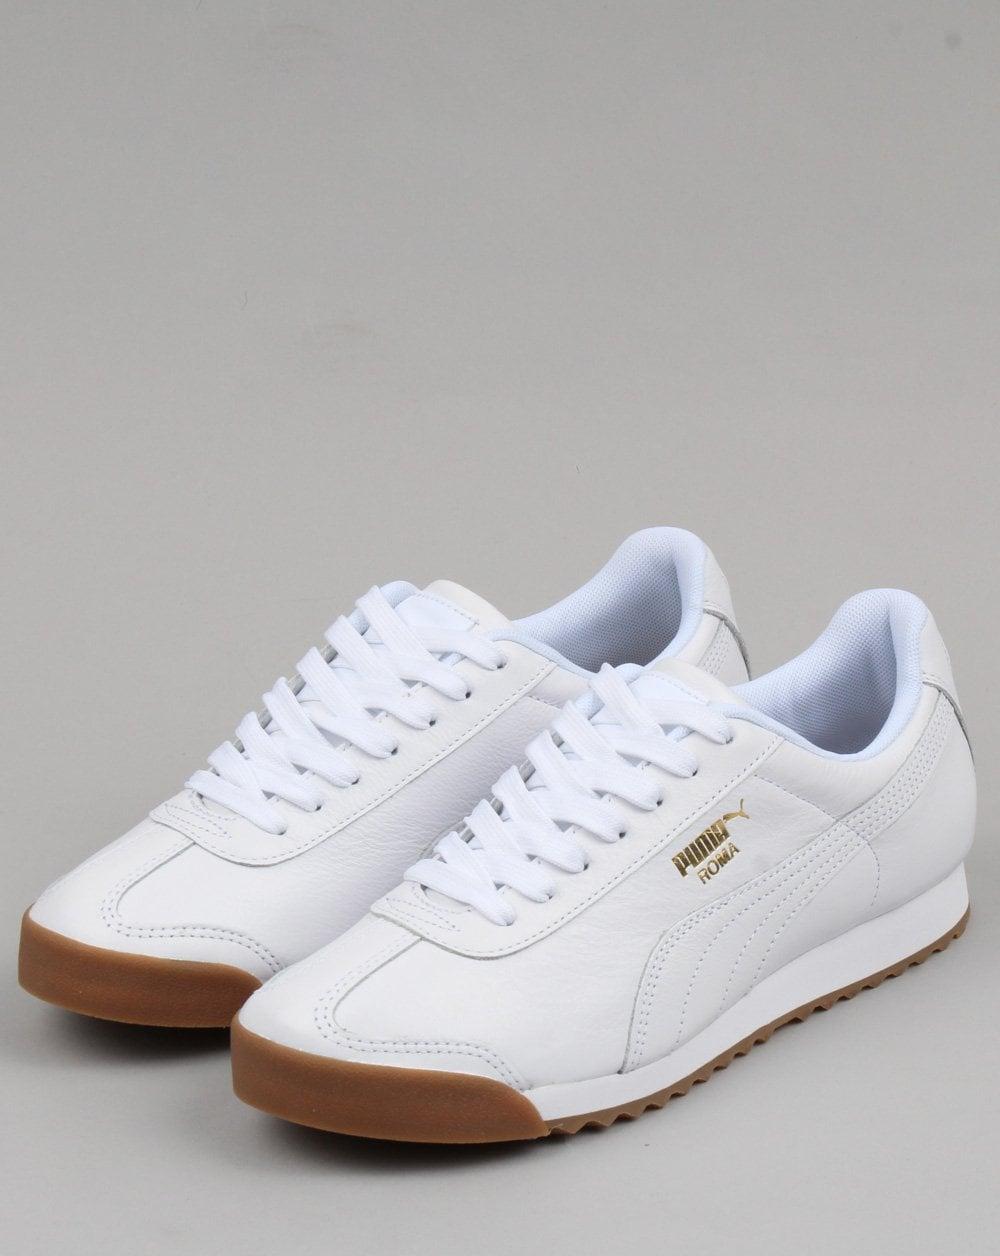 ff76dcf1fb9d6d Puma Roma Classic Gum Trainer White Gold leather